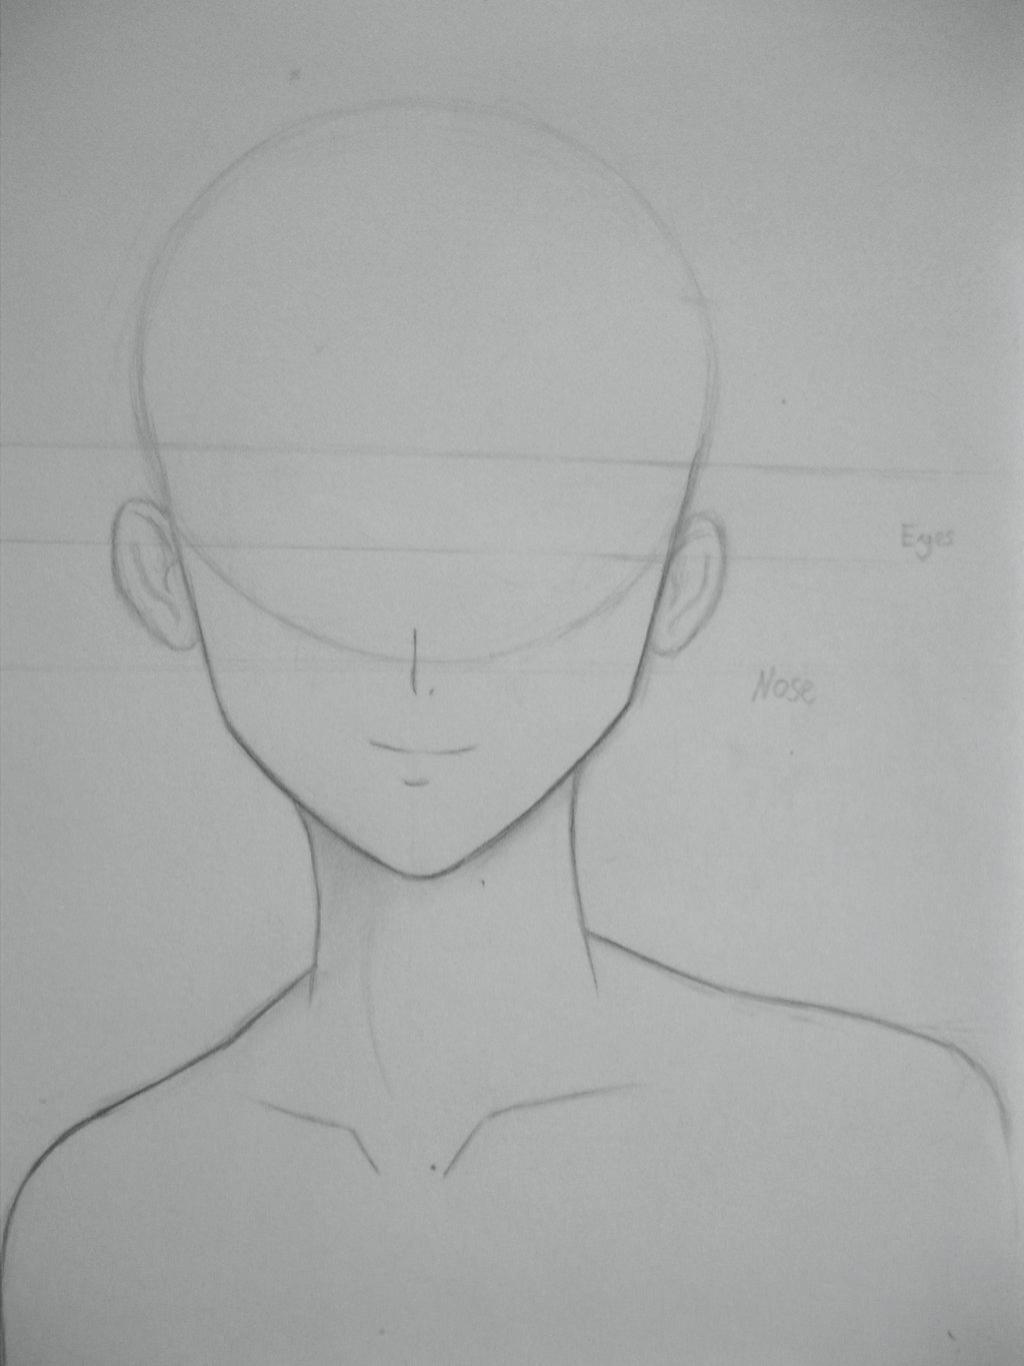 Basic Anime/Manga figure template by Stylin16 on DeviantArt